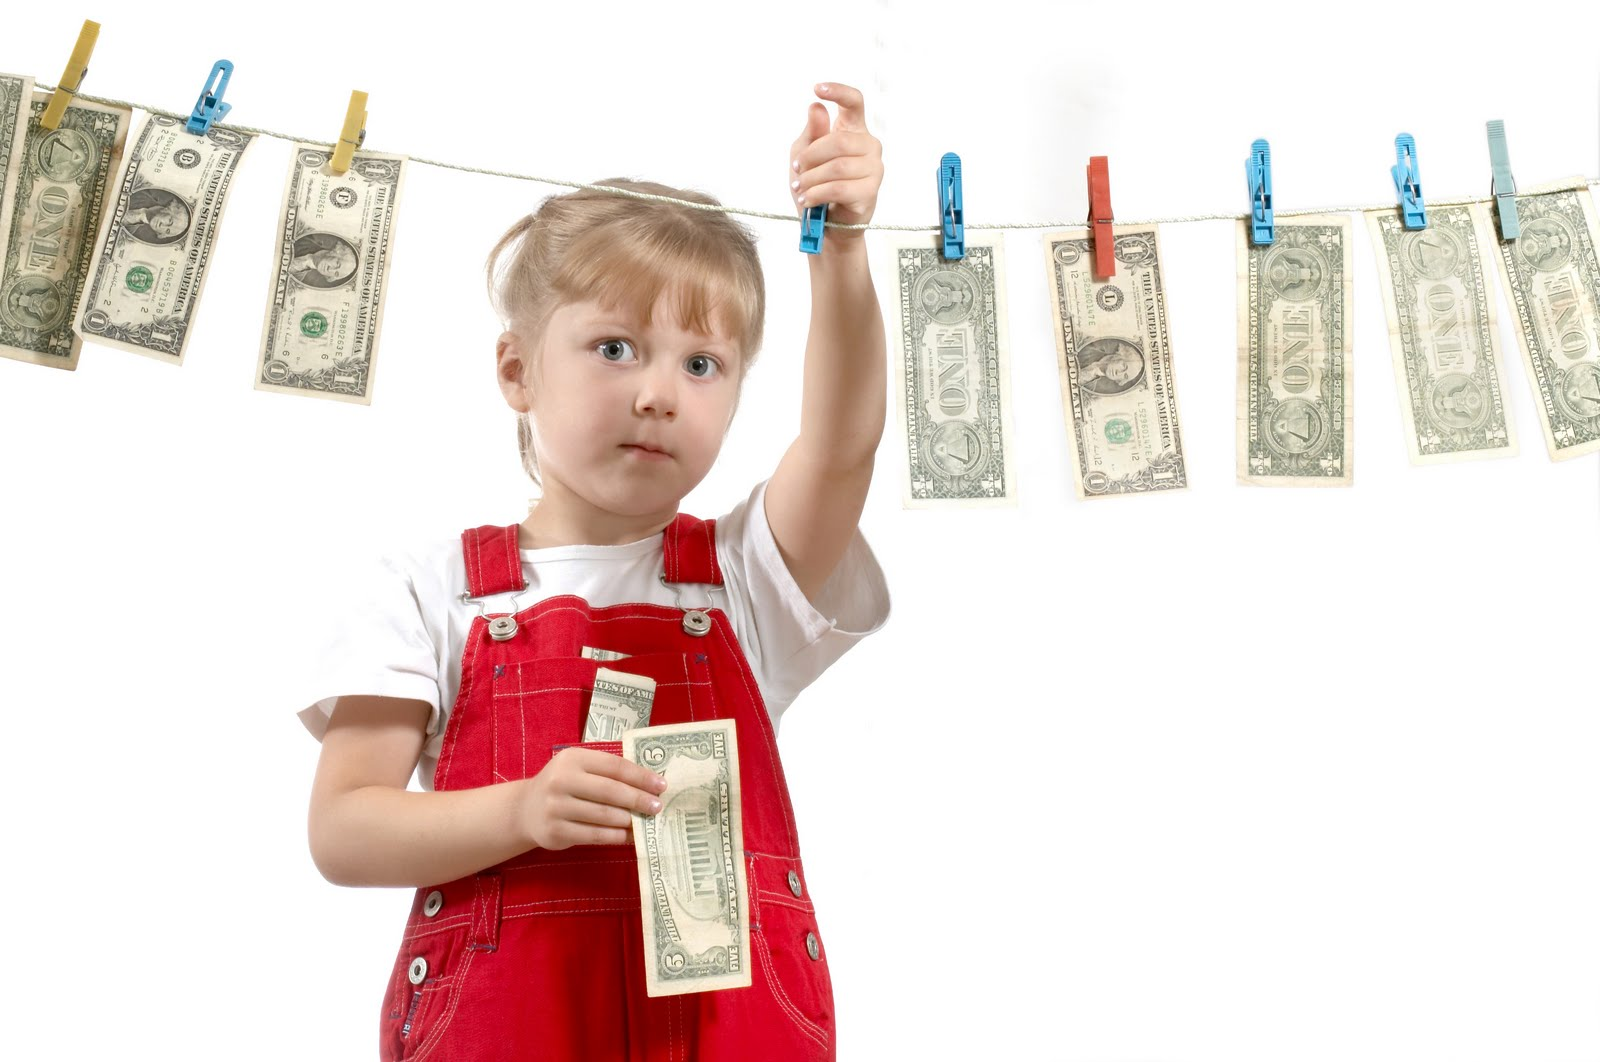 http://1.bp.blogspot.com/-GYQgDLJ2pRw/ThgnNBNjMwI/AAAAAAAAAzQ/kjCTRQHXLi4/s1600/Teen+online+make+money.jpg